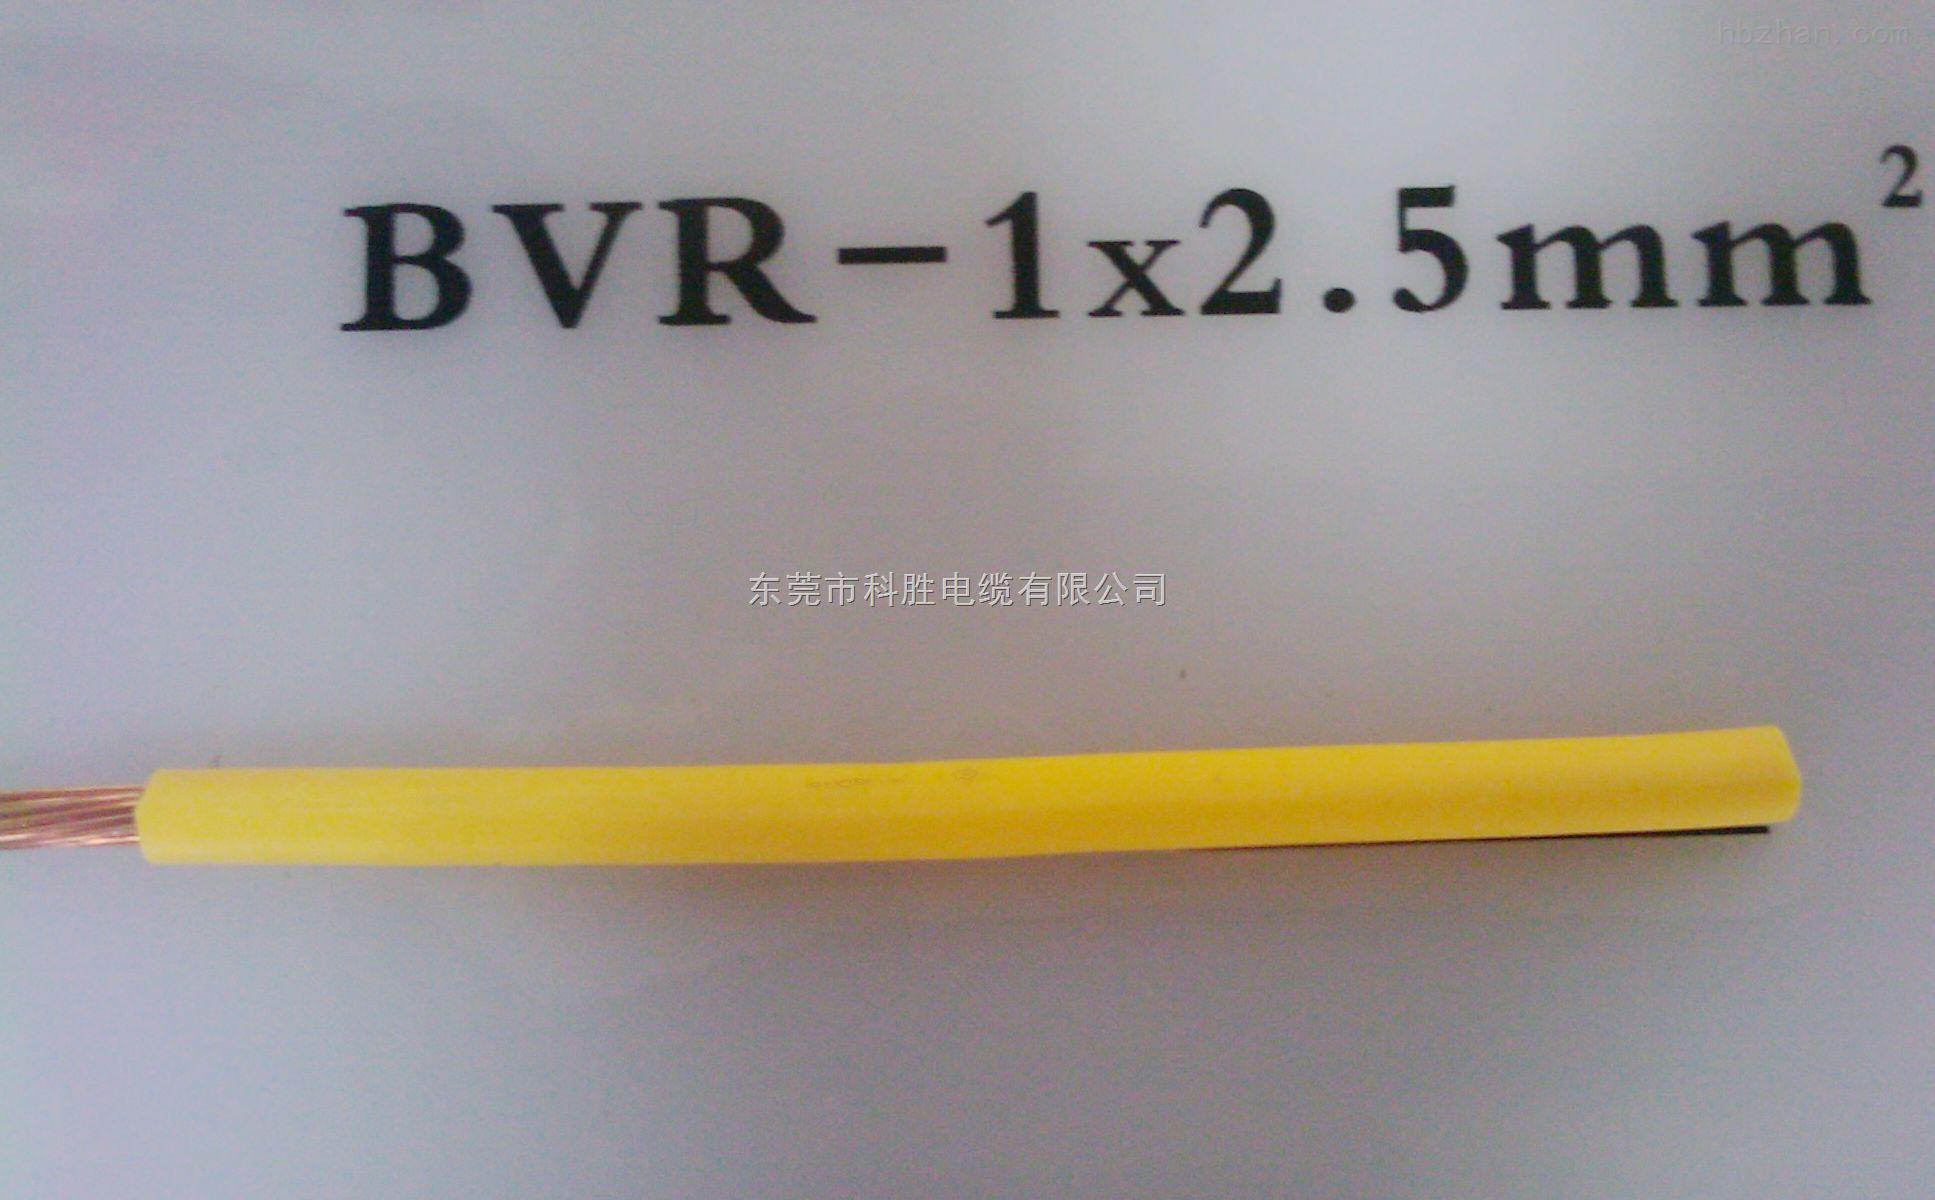 龙胜t8led直管接线图